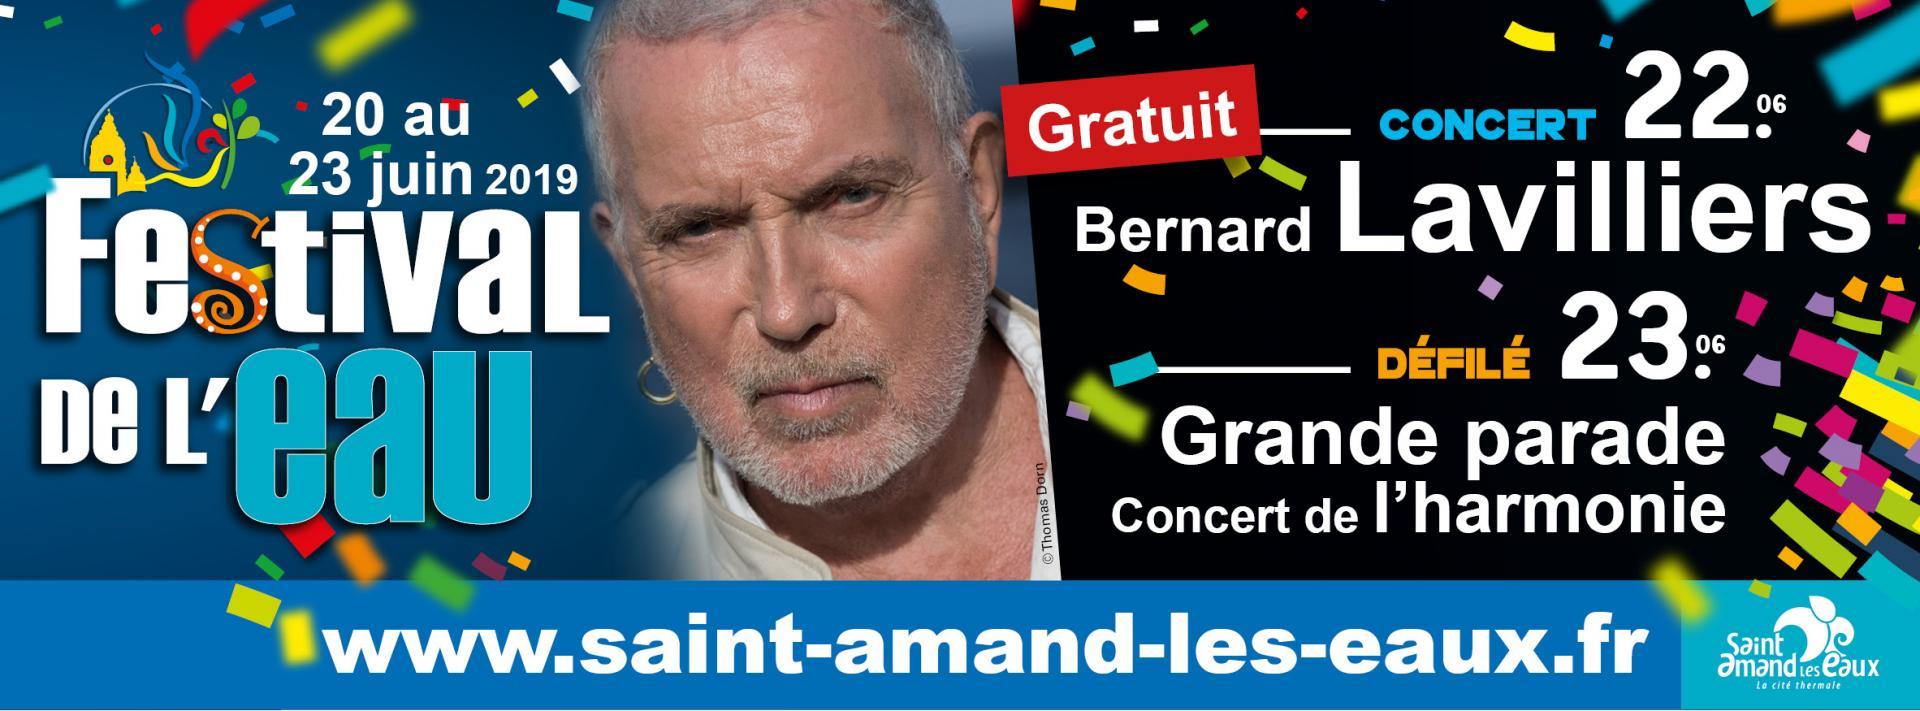 Concert bernard lavilliers ville de saint amand les eaux - Piscine saint amand les eaux horaires ...